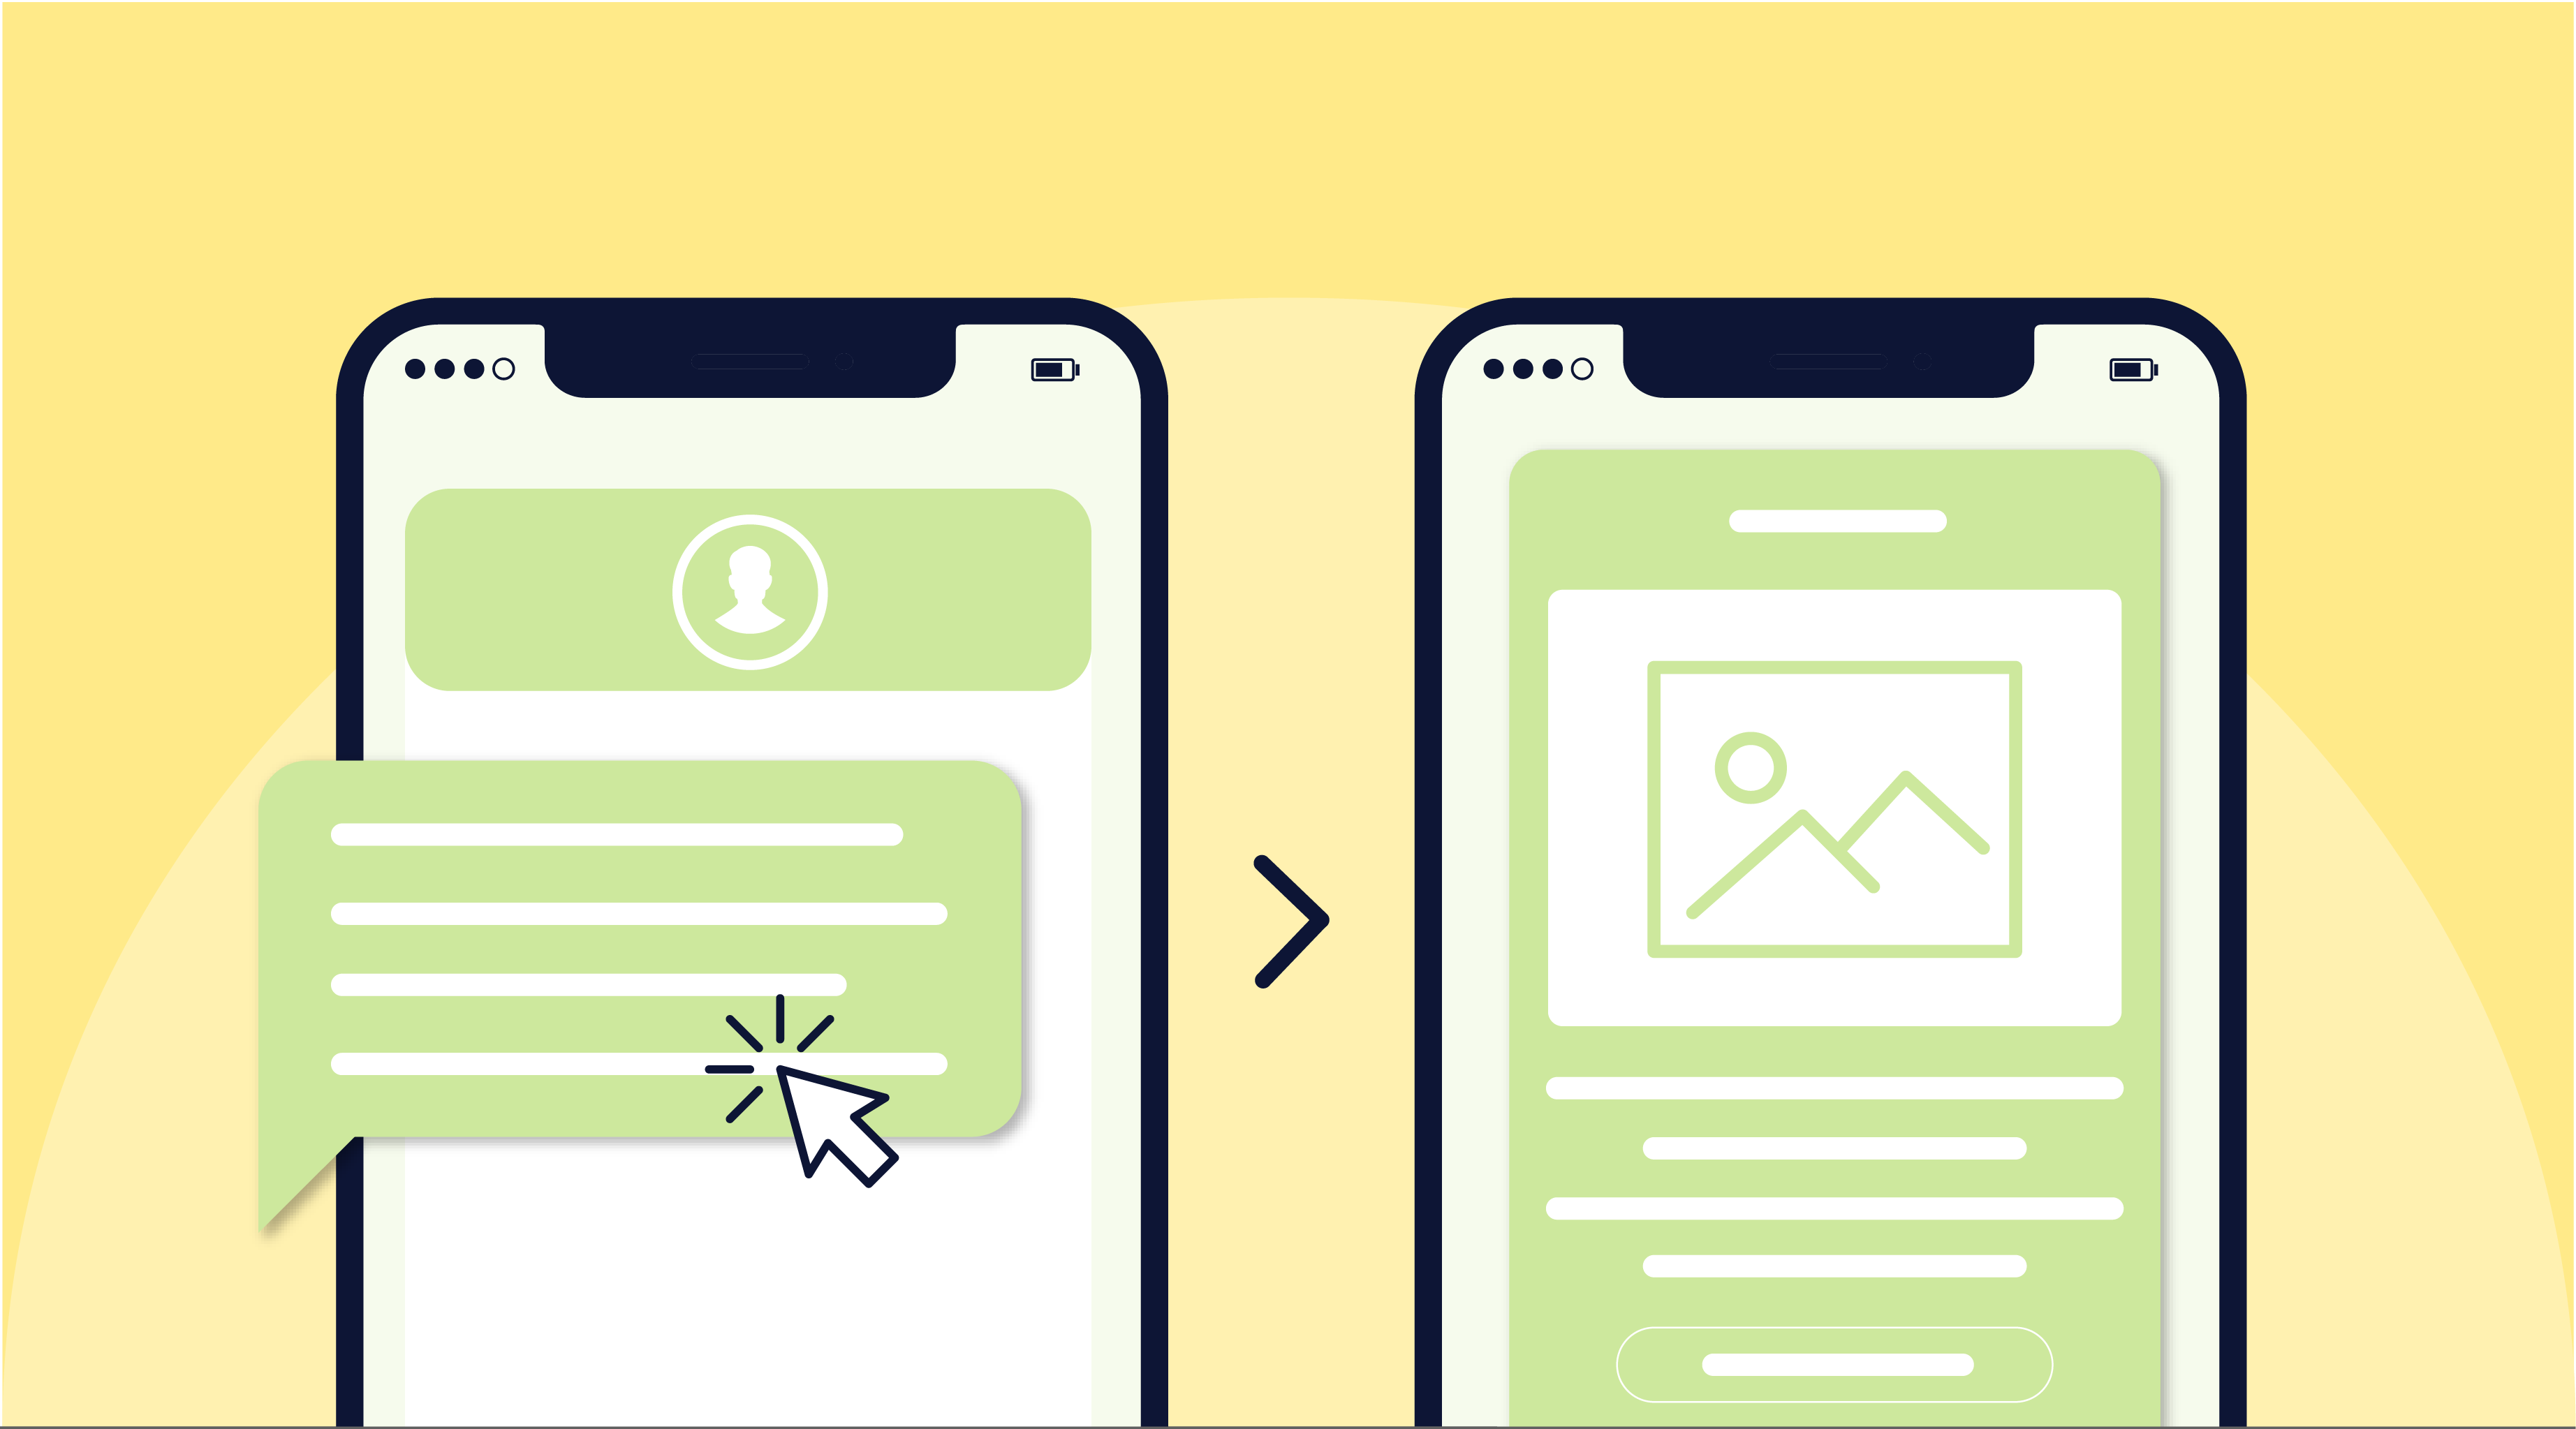 mobile-phone-sms-illustration